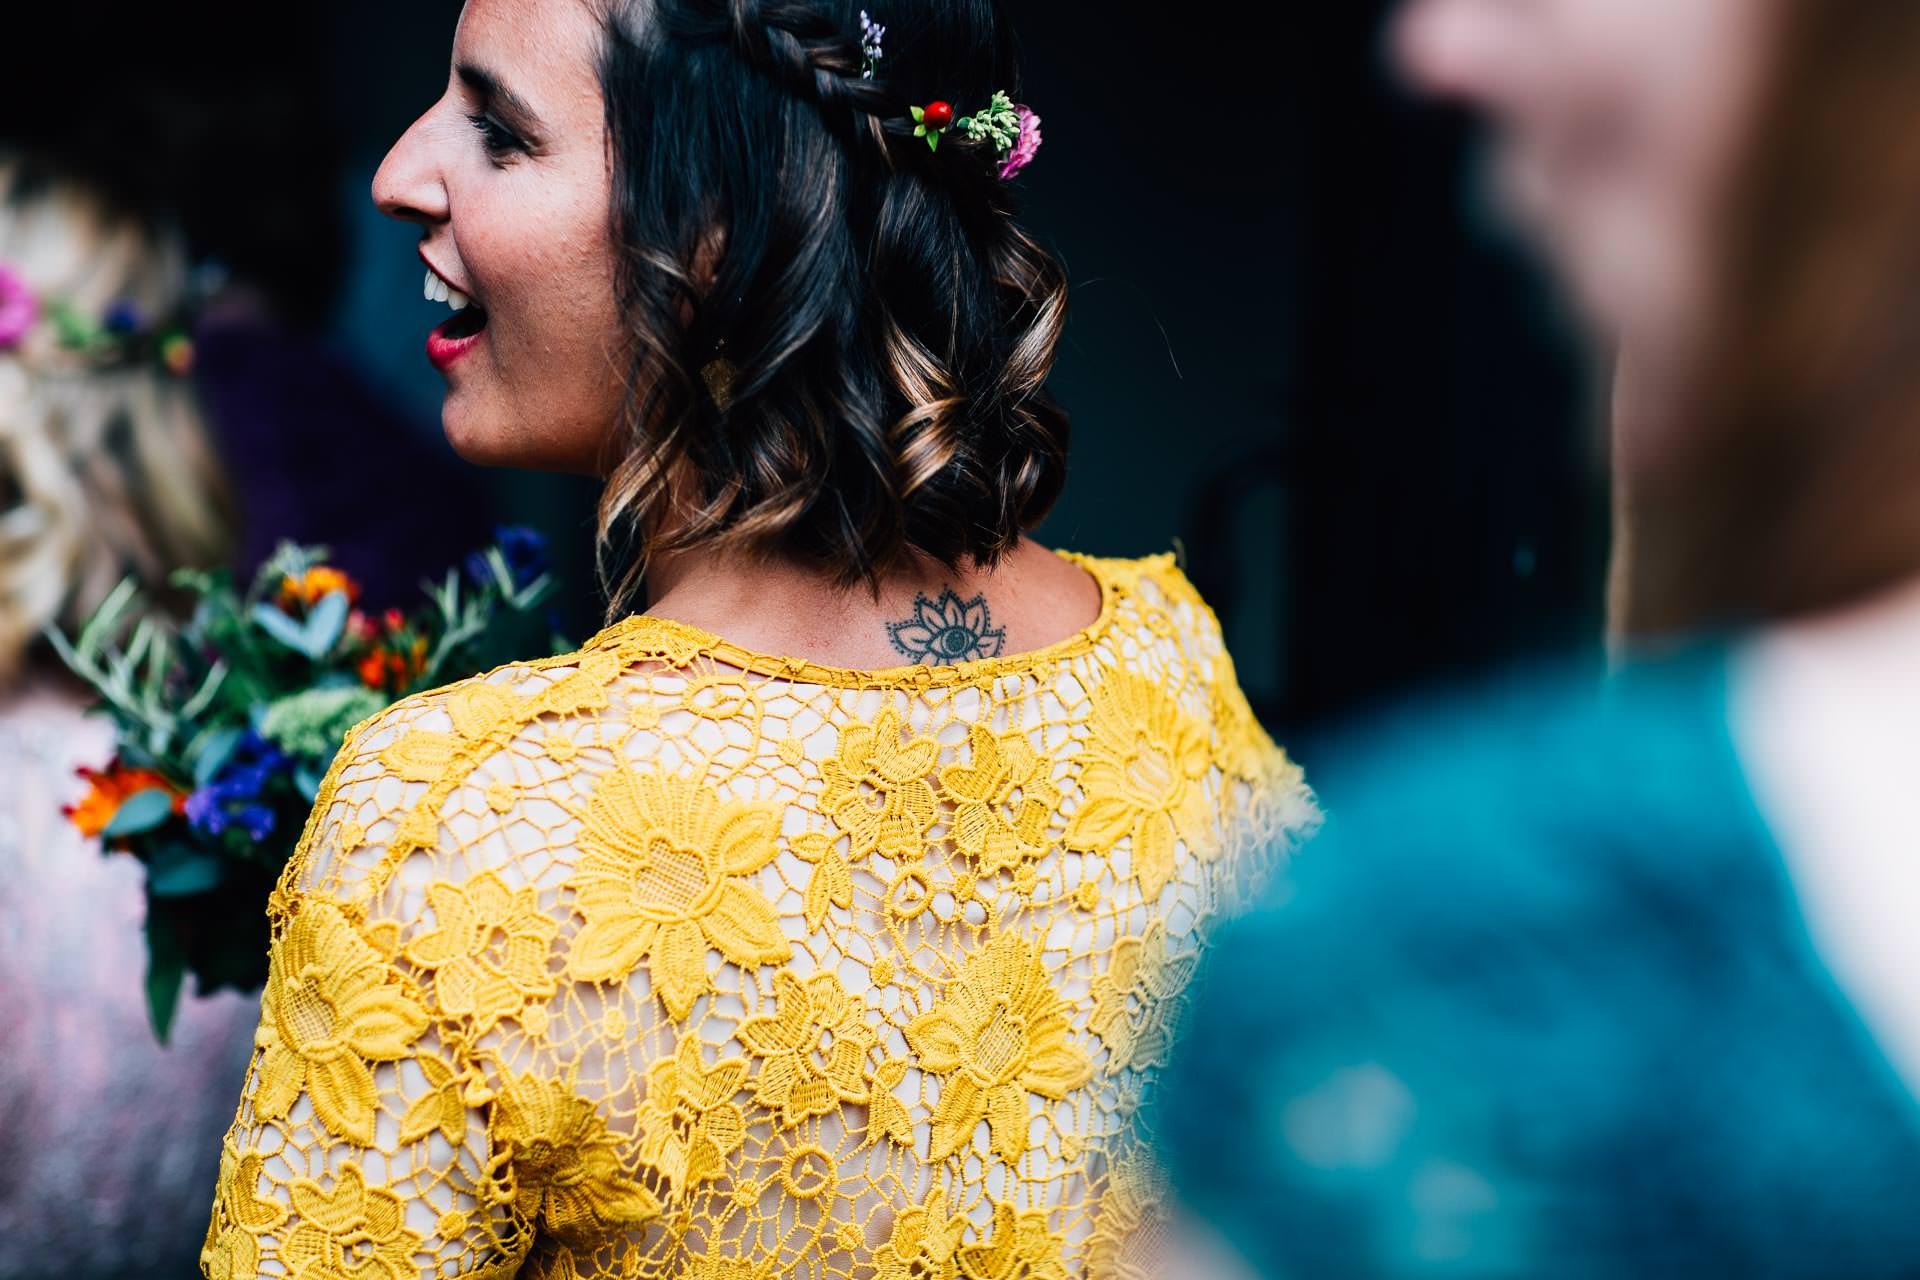 winterbourne-medieval-barn-wedding-photography-emma-andrew-57